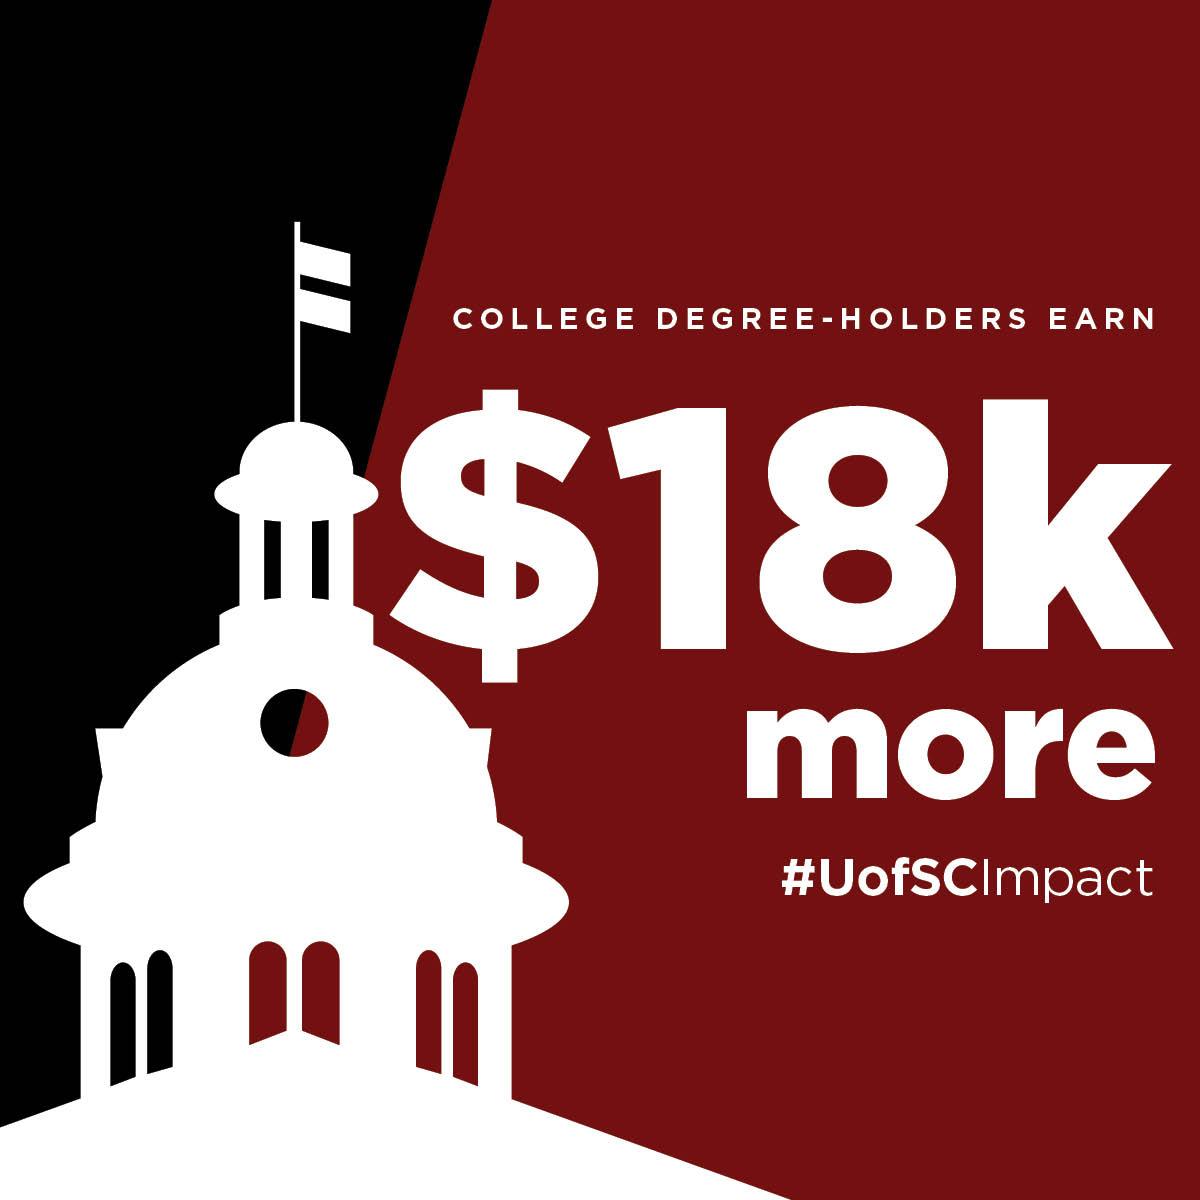 College degree-holders earn $18k more #UofSCImpact